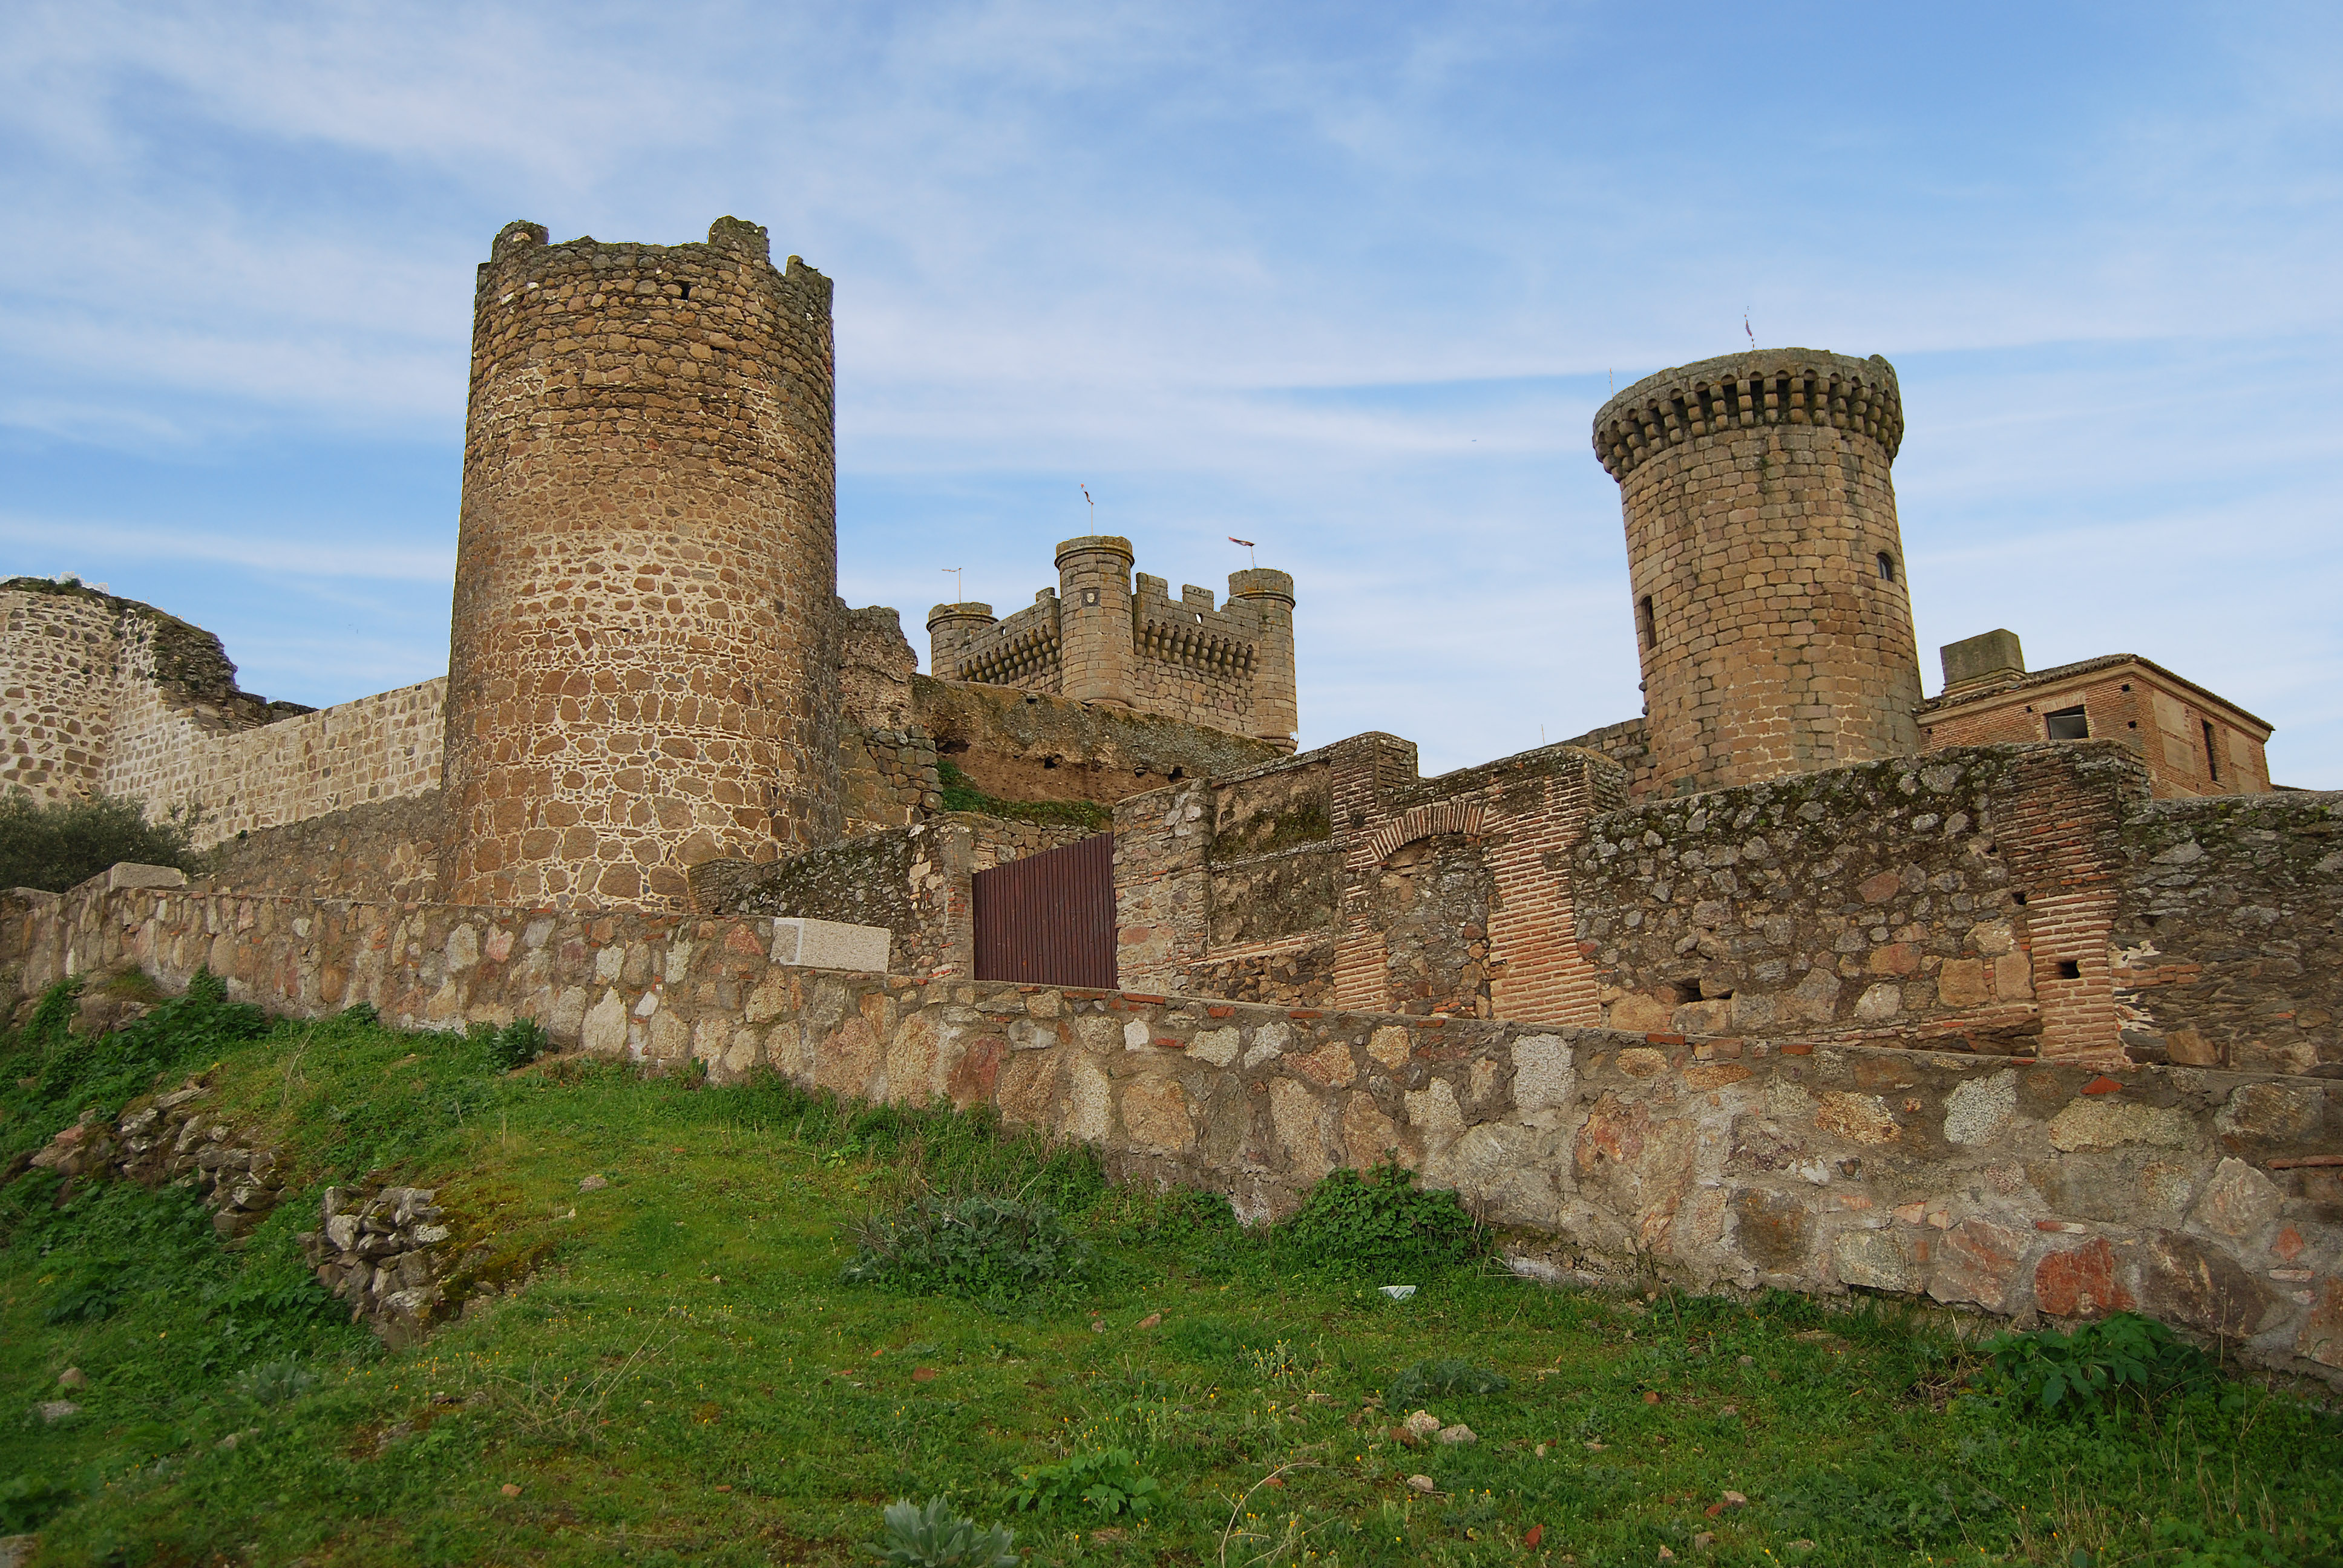 Oropesa Spain  city photos gallery : Castillo de Oropesa Toledo España | Castillo de Oropesa: f ...